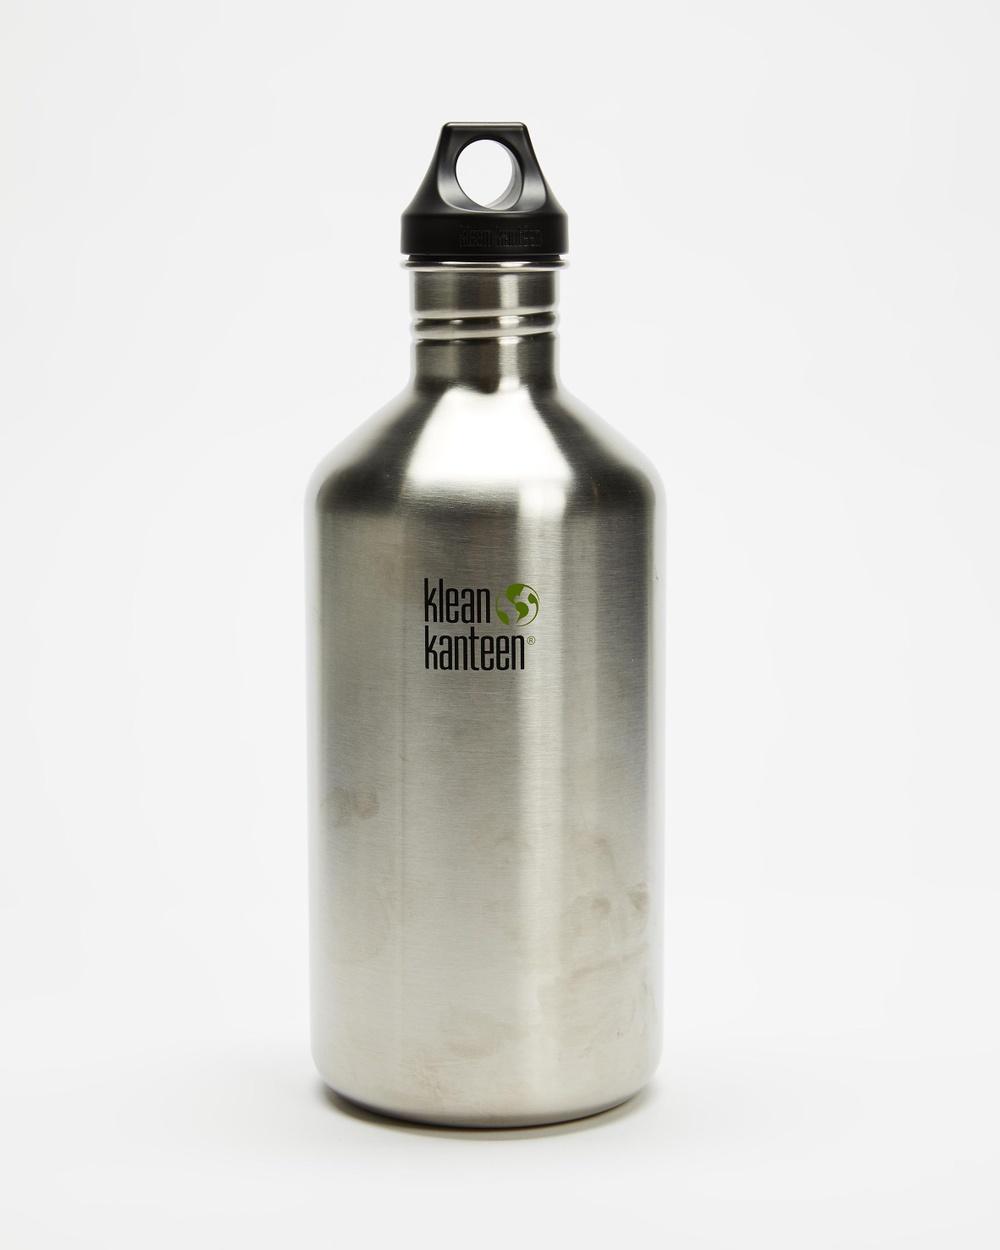 Klean Kanteen 64oz Classic Loop Cap Bottle Running Brushed Stainless